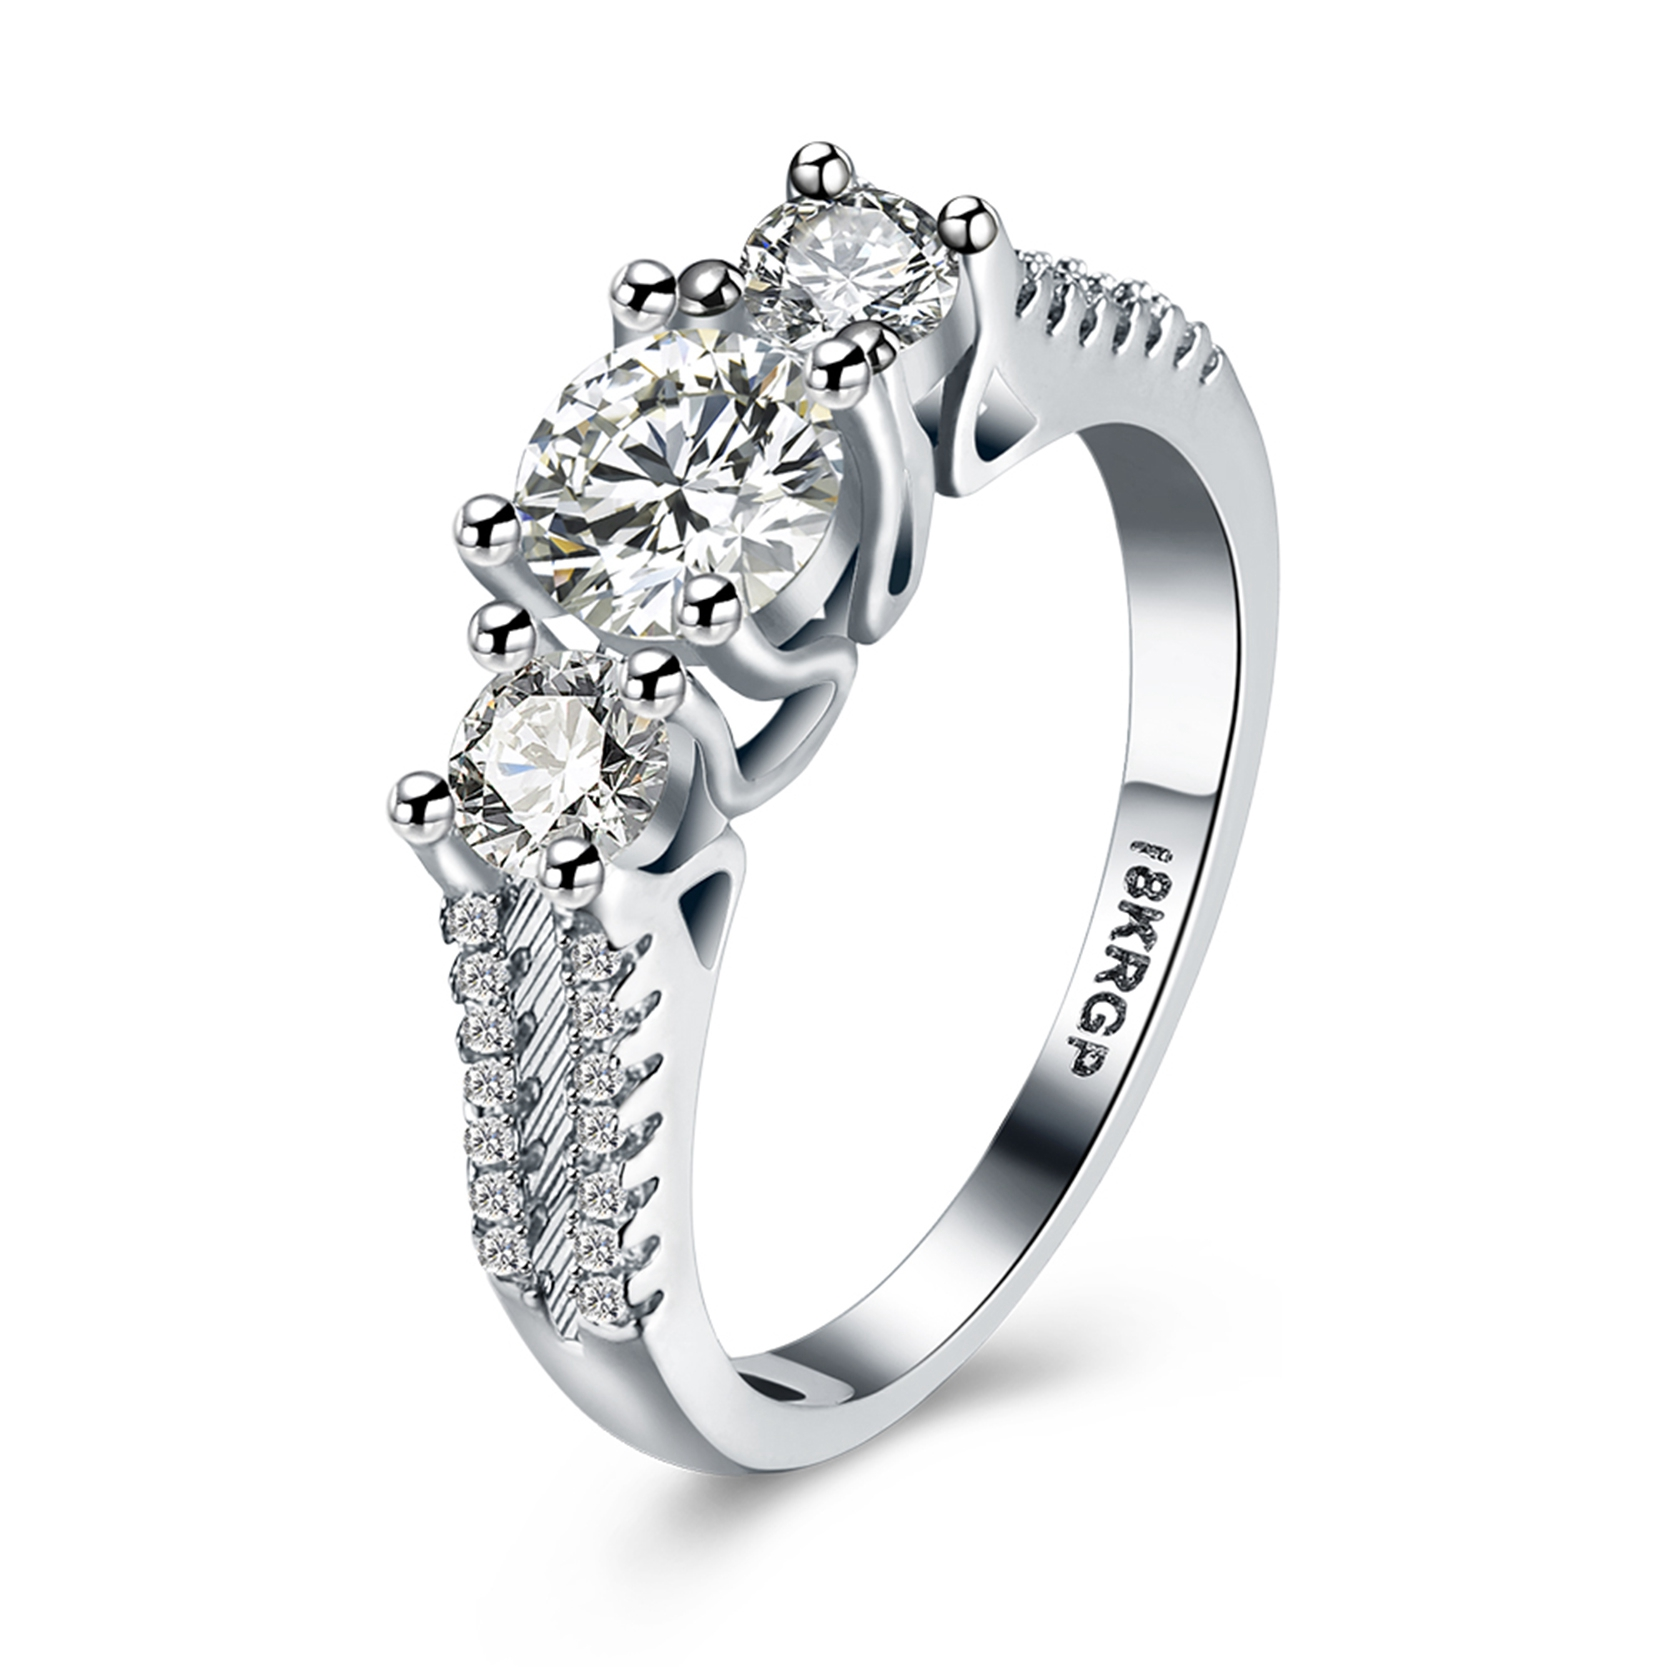 online get designer platinum enement rings aliexpress